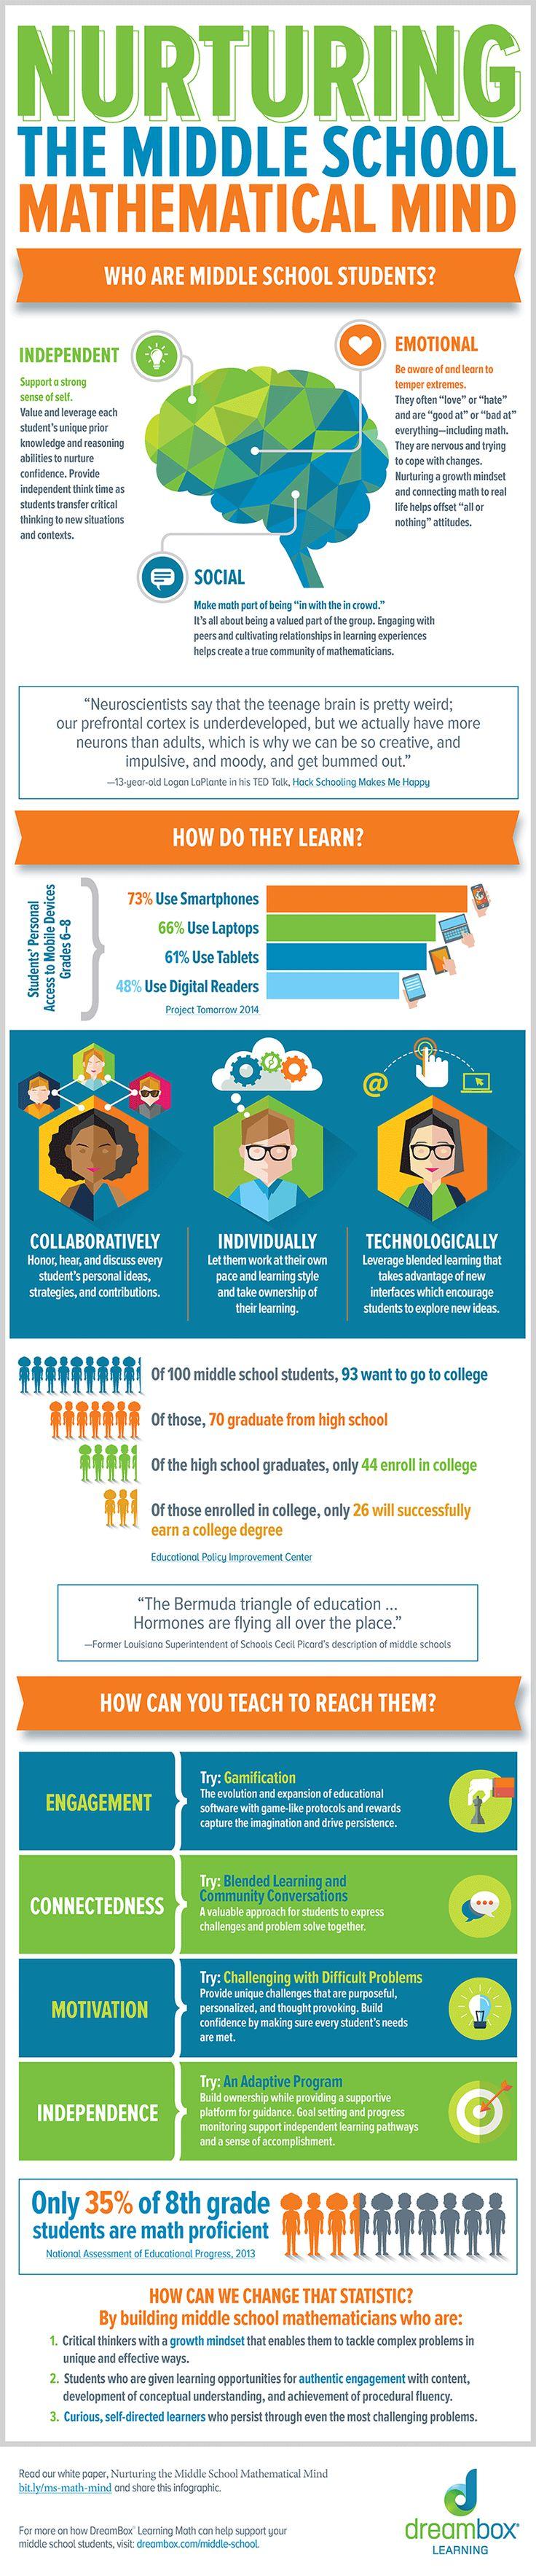 Nurturing the Middle School Mathematical Mind Infographic